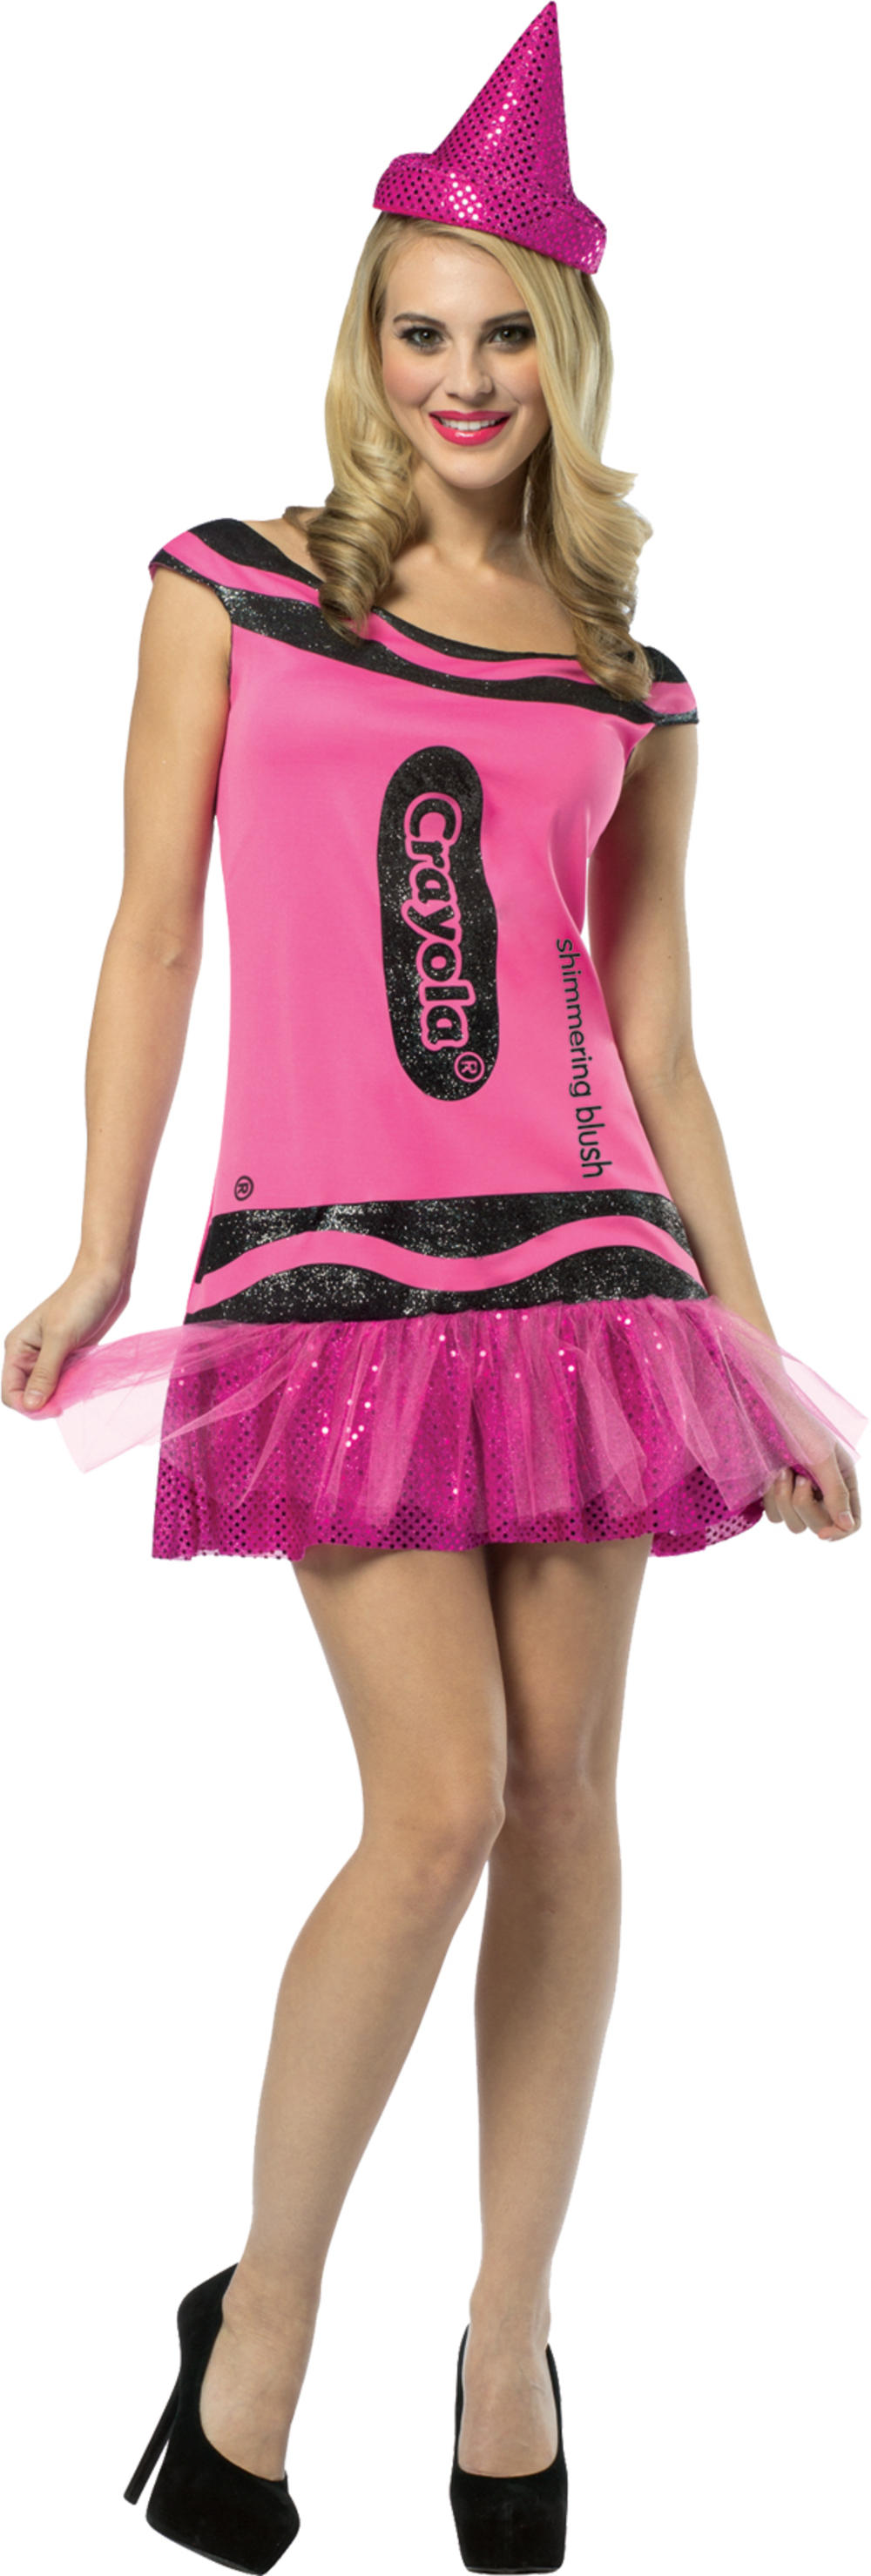 Blush Pink Crayola Glitter Dress Women's Costume